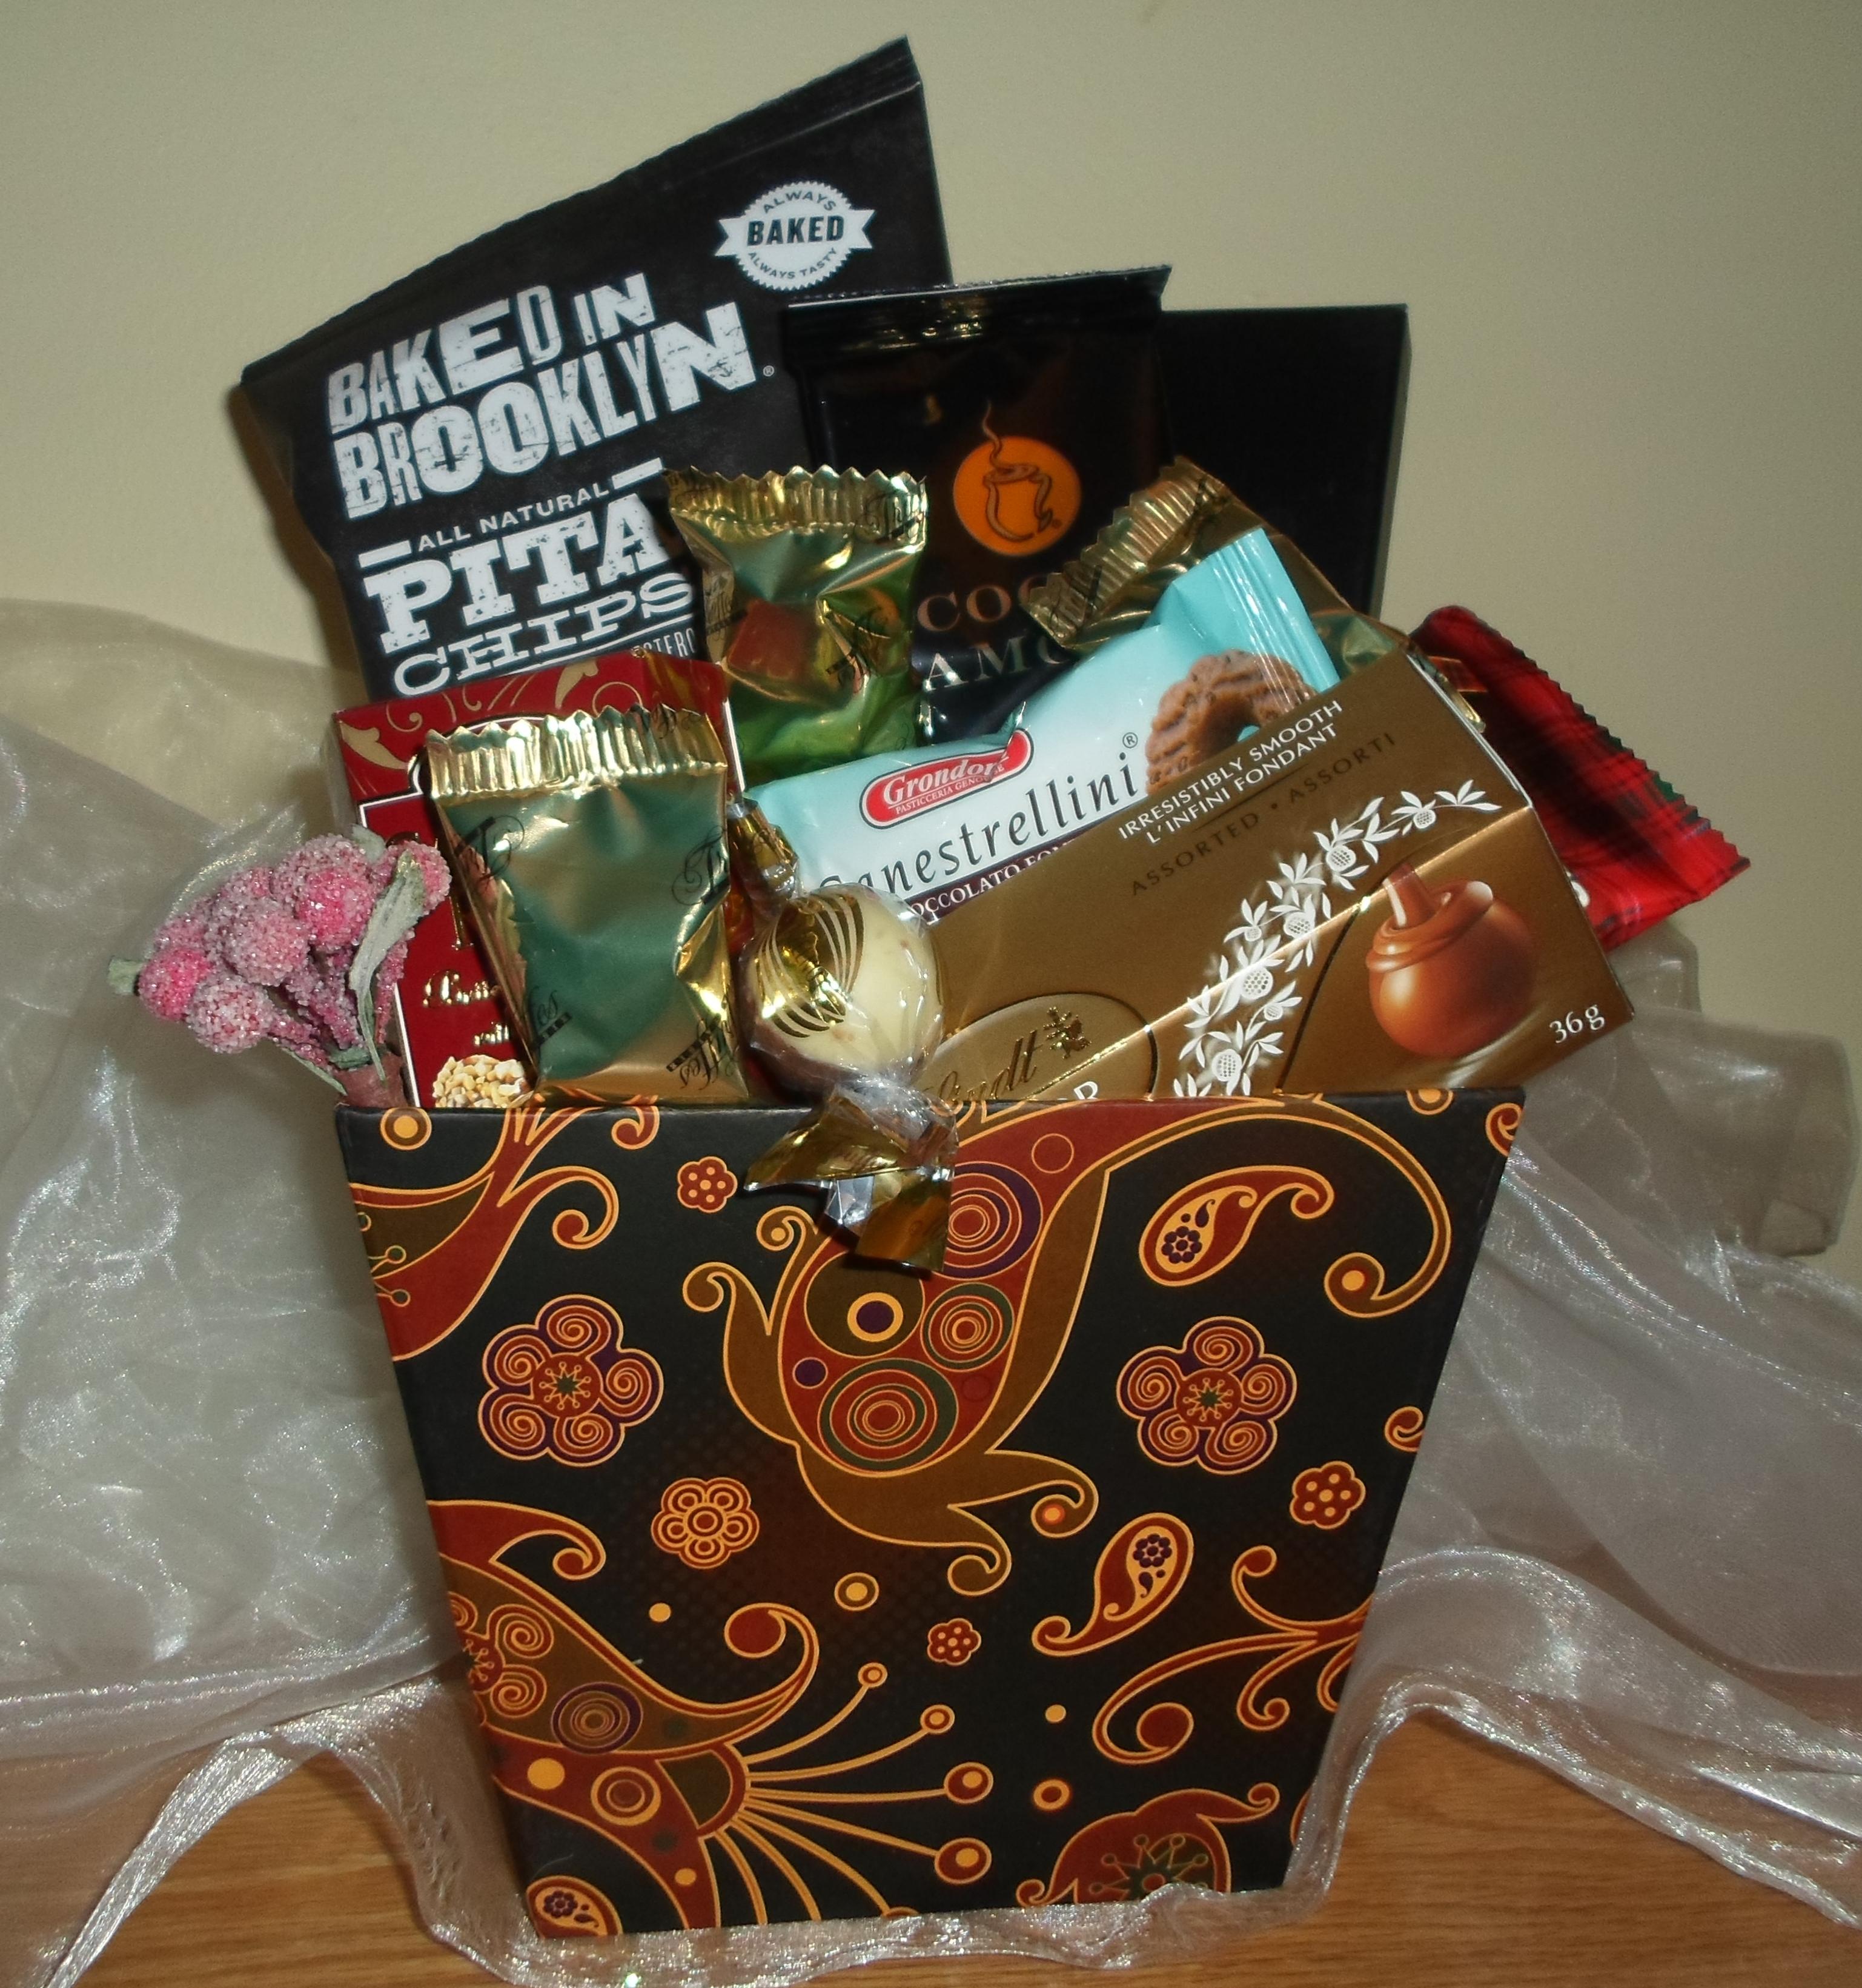 Brown paisley gift basket